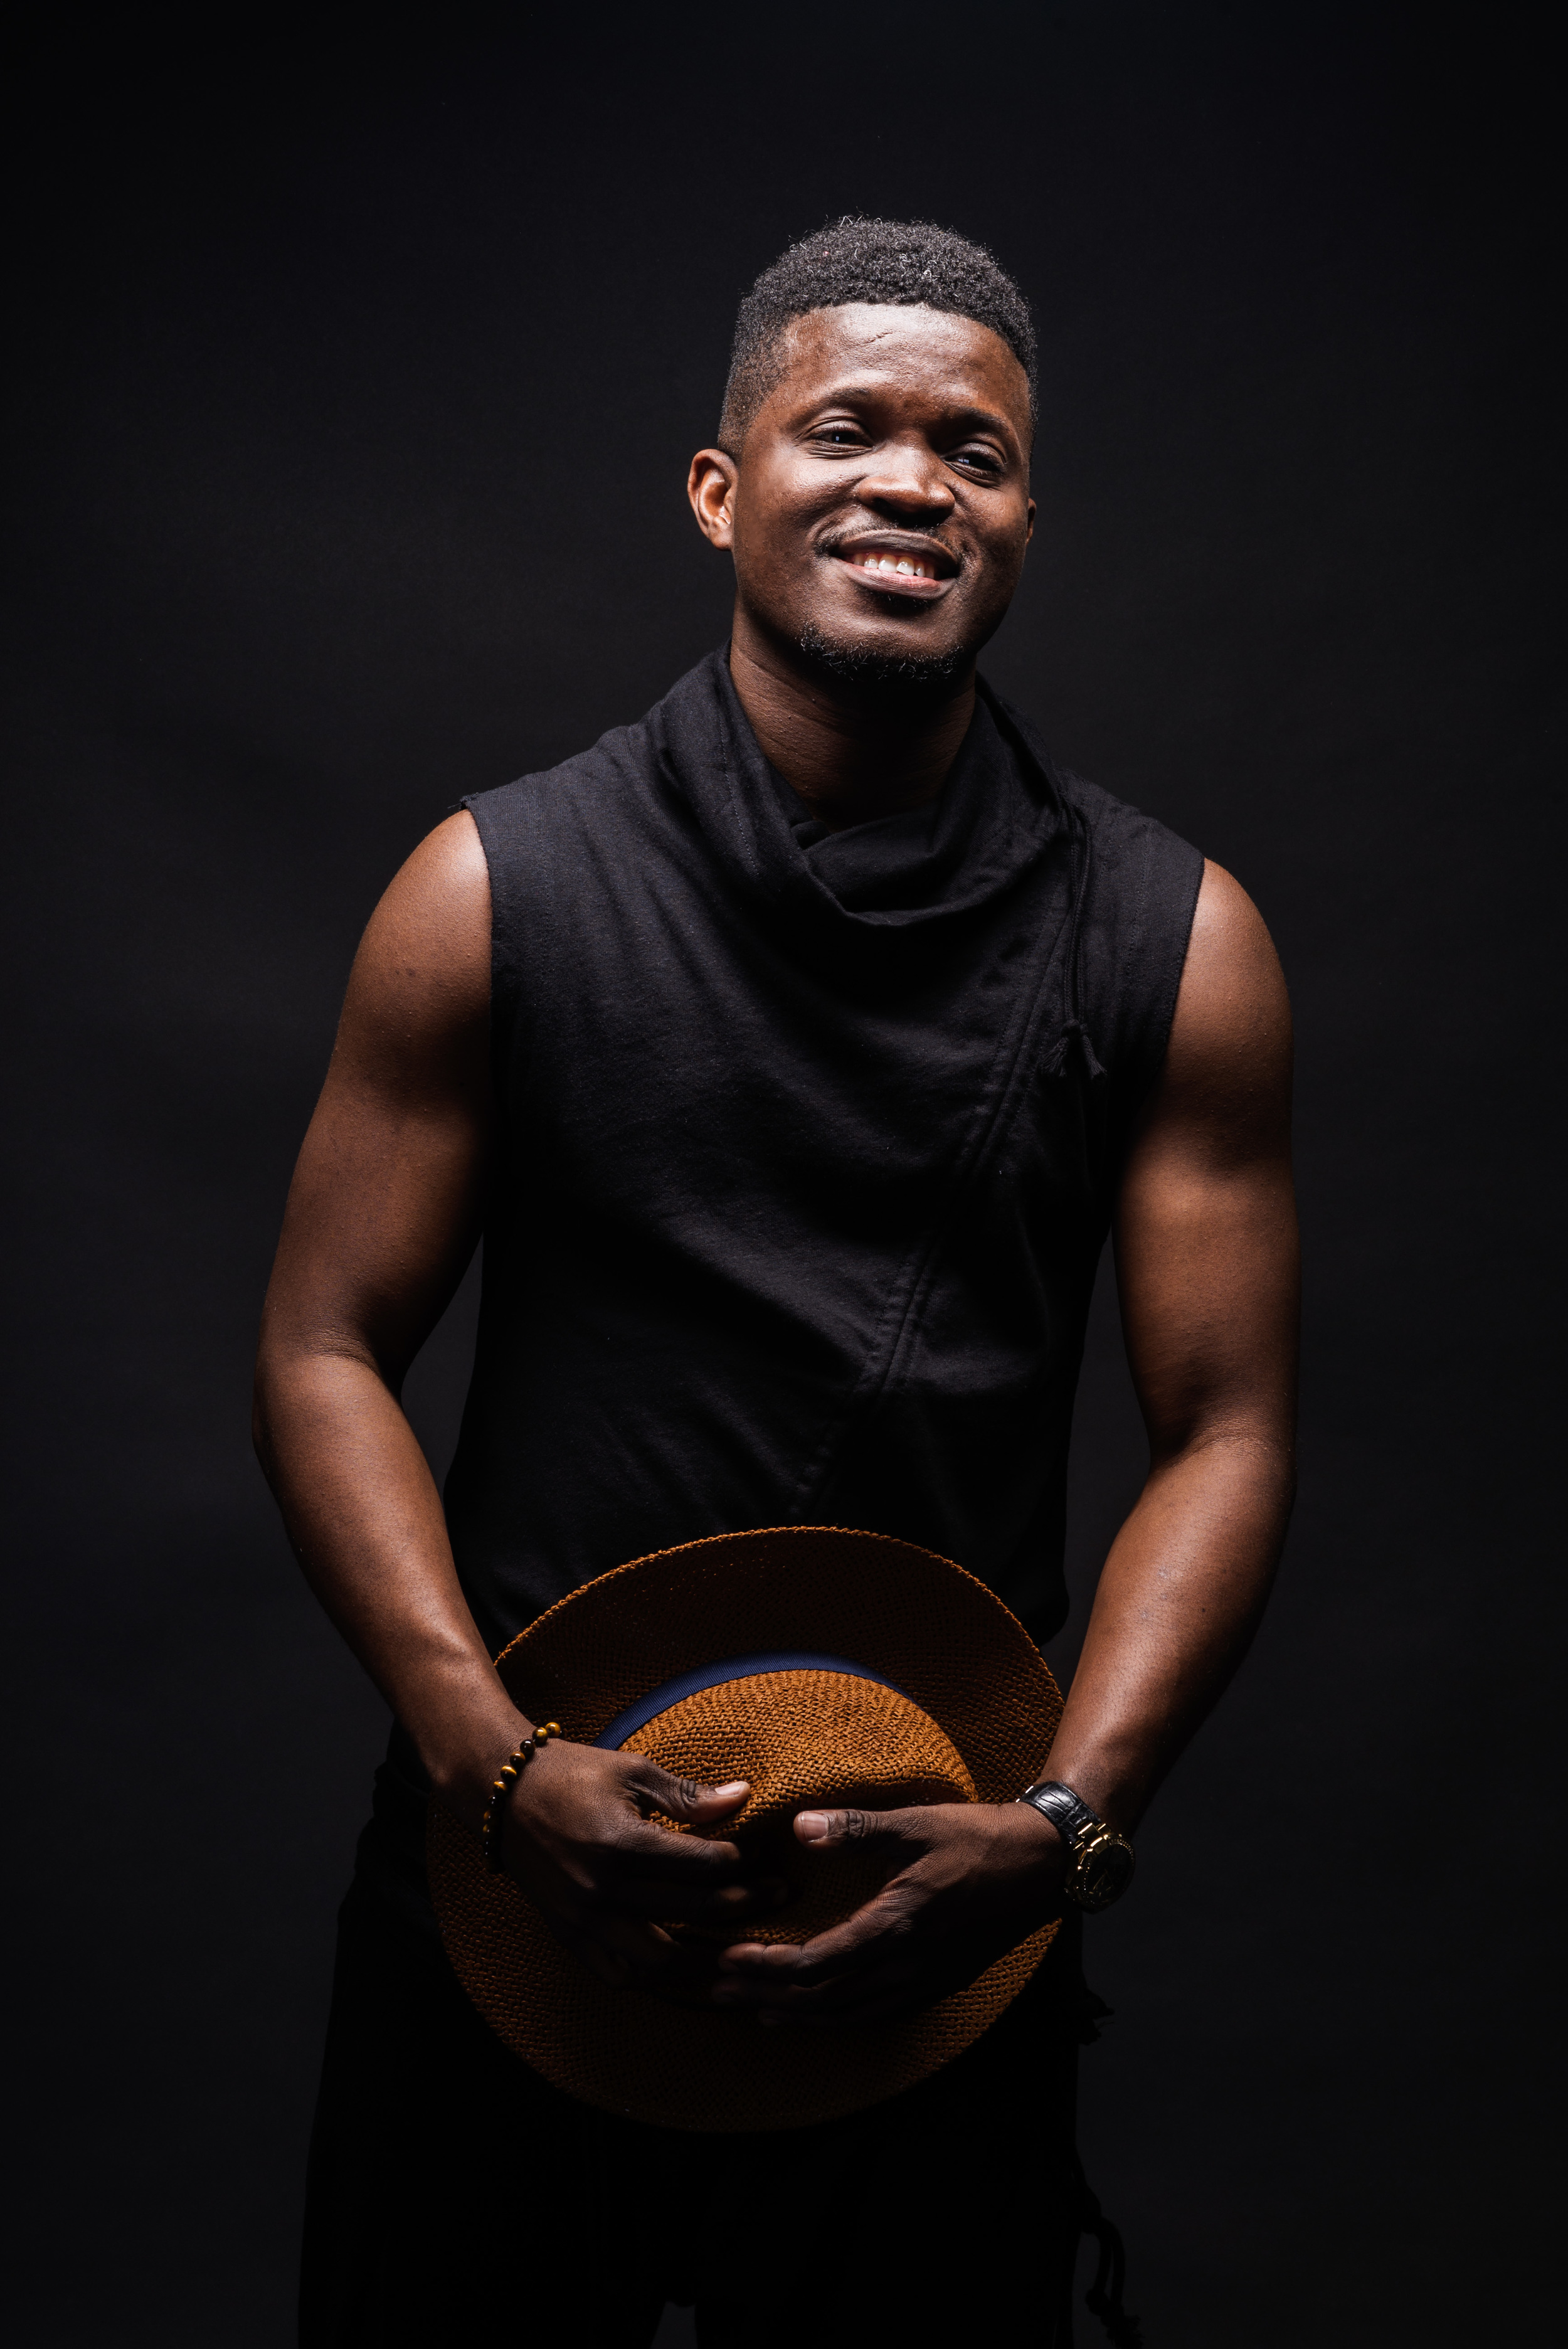 Laolu Senbanjo photo by Ima Mfon